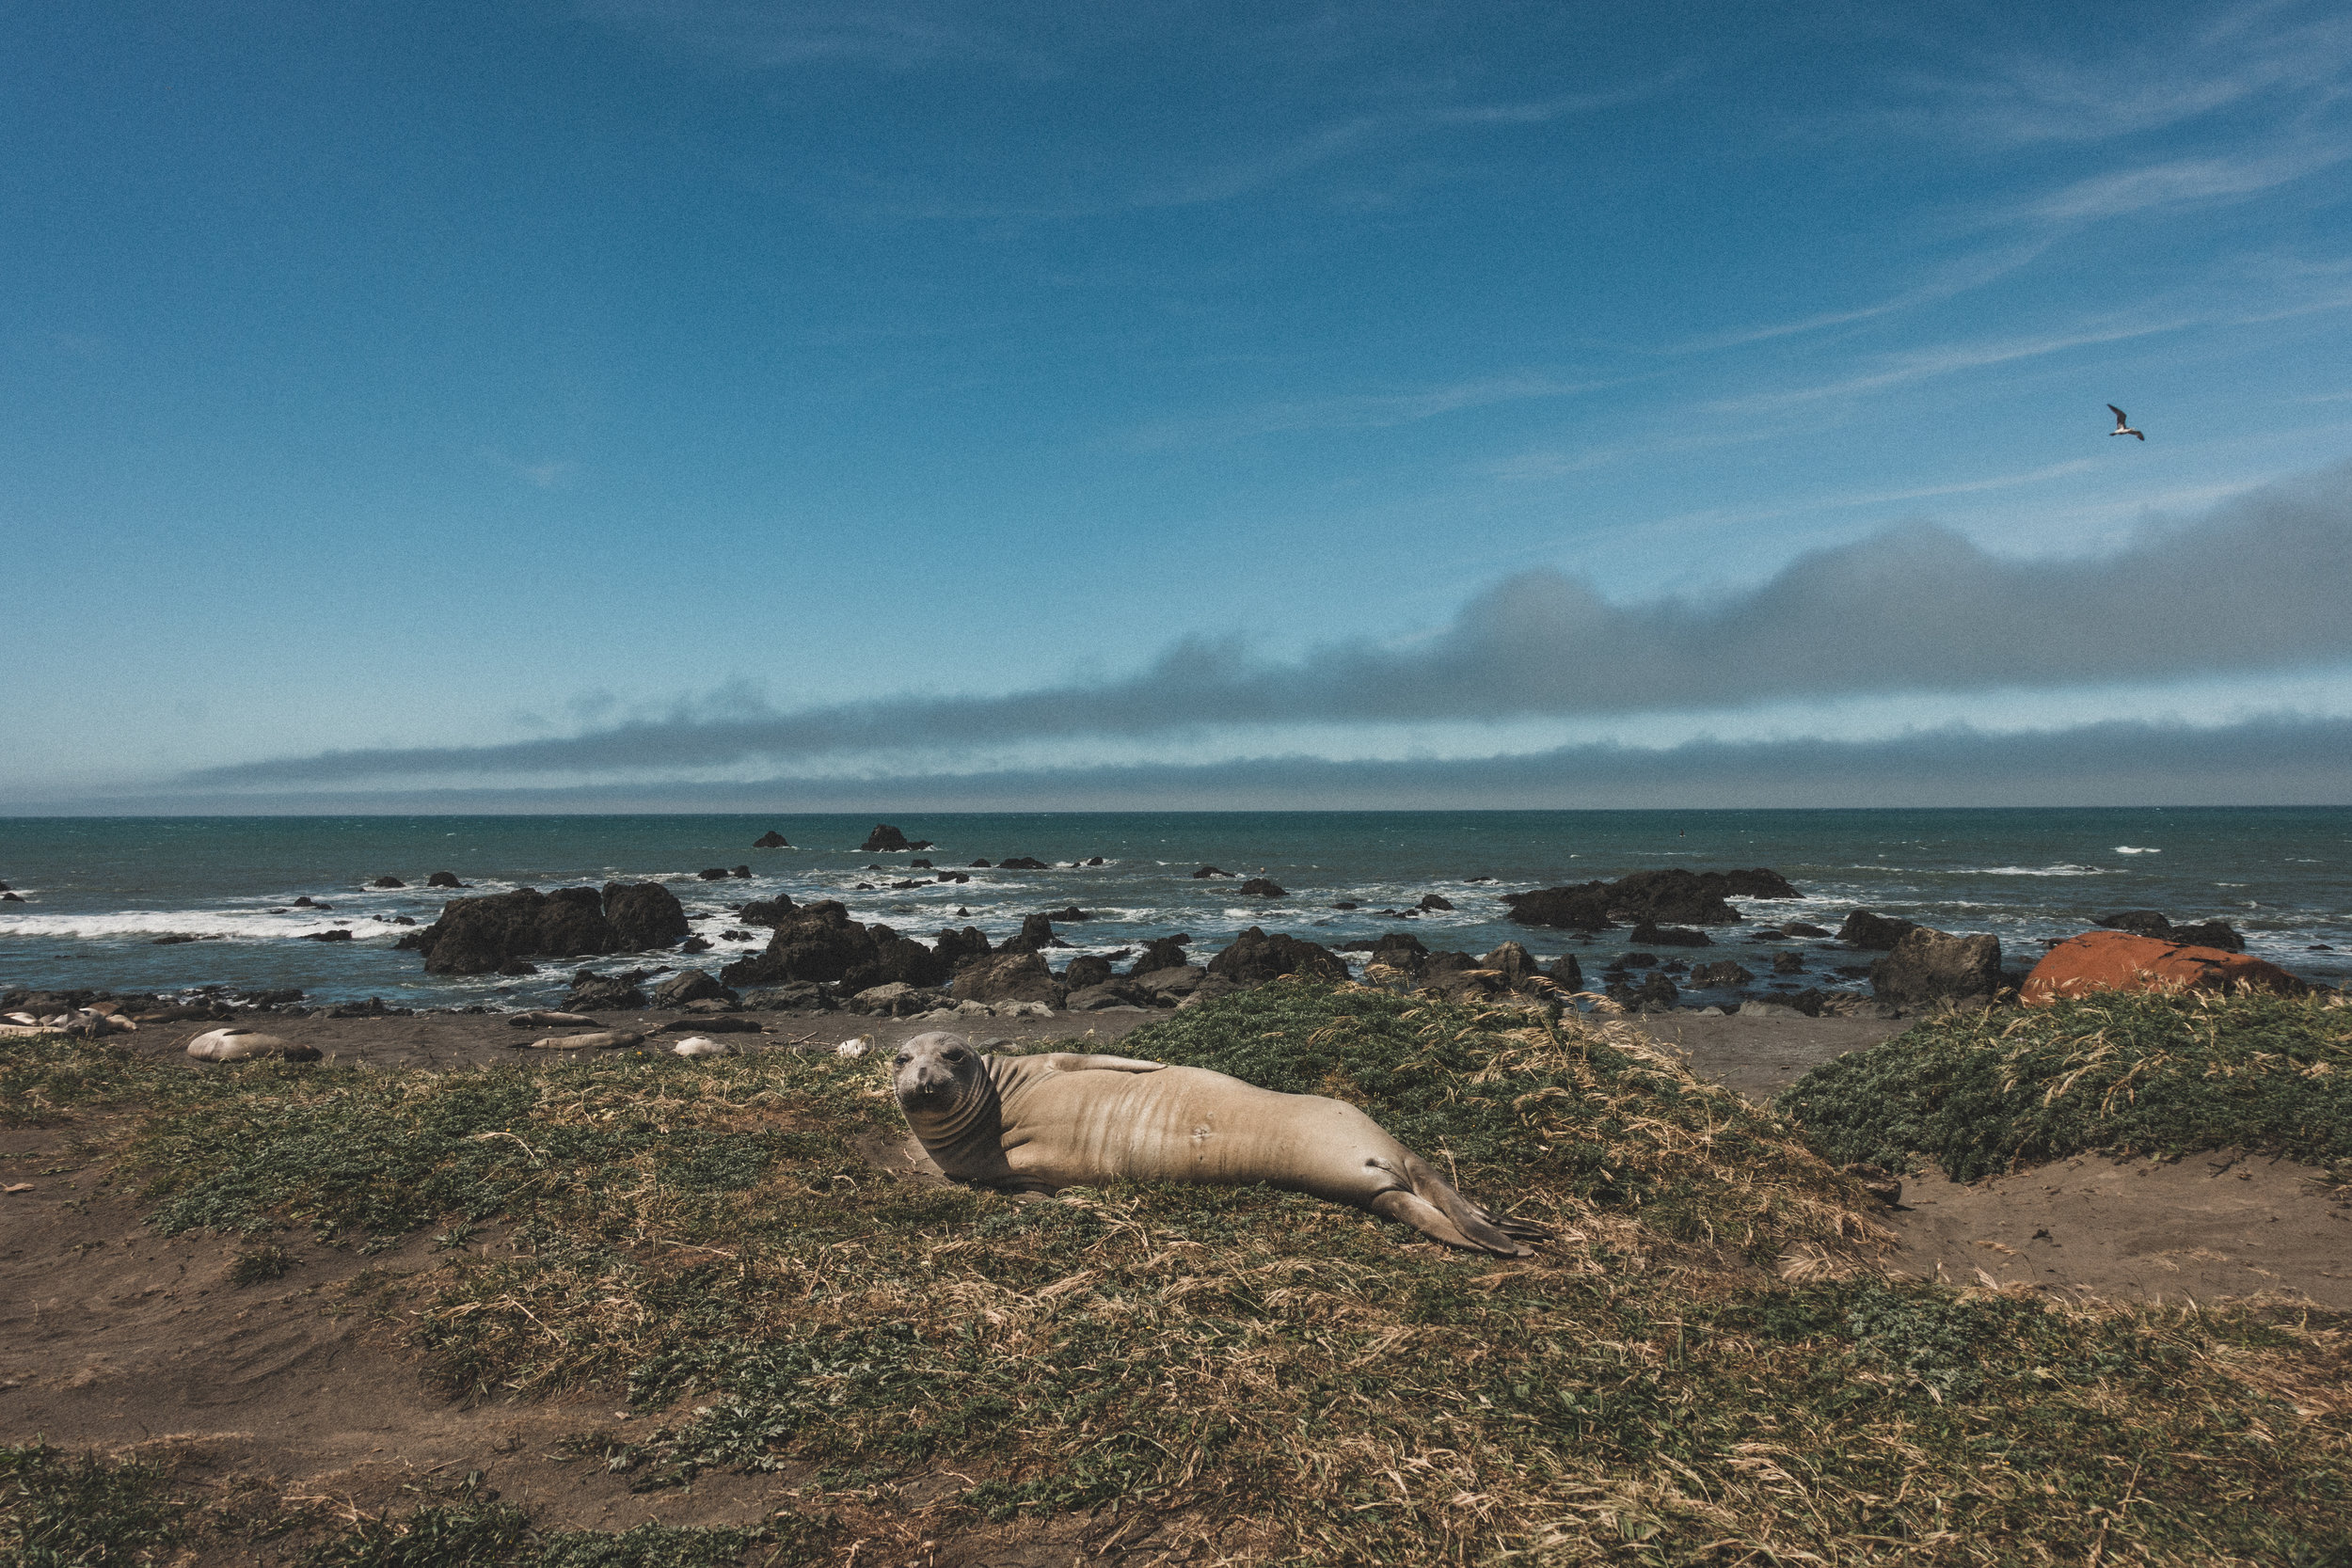 Seals at the Lost Coast